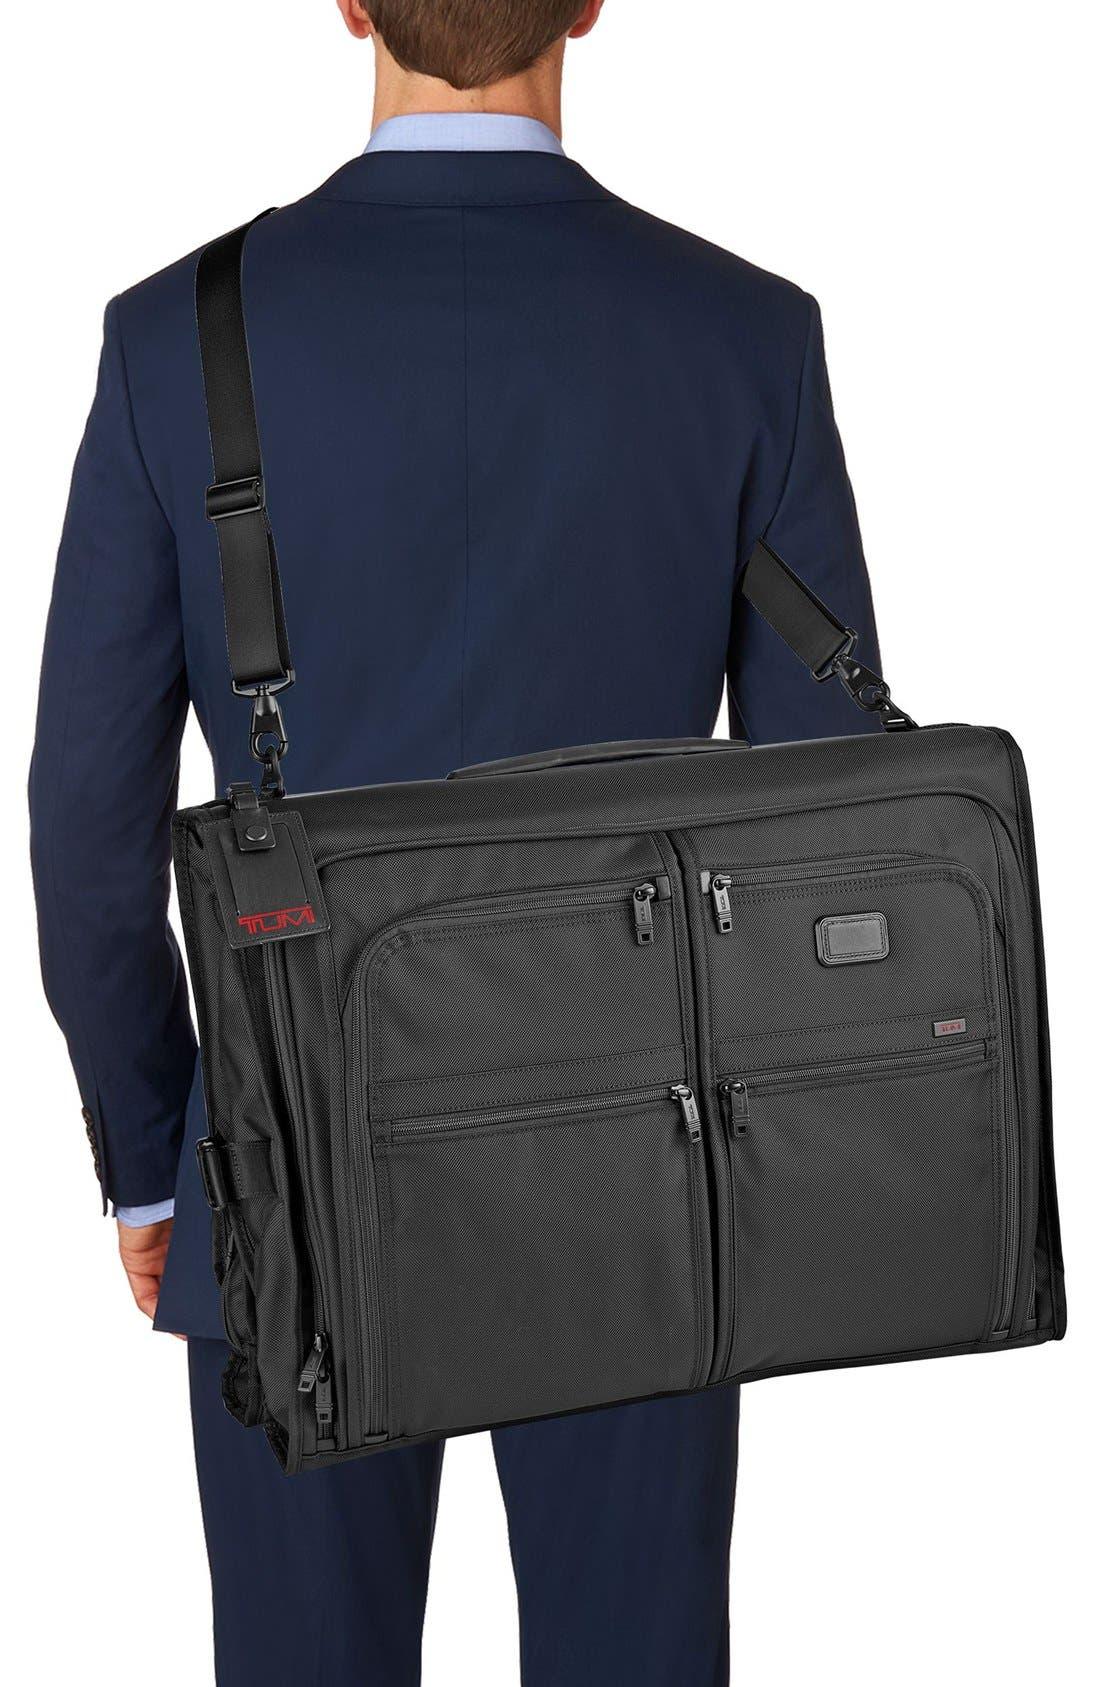 TUMI,                             Alpha 2 Classic Garment Bag,                             Alternate thumbnail 4, color,                             001